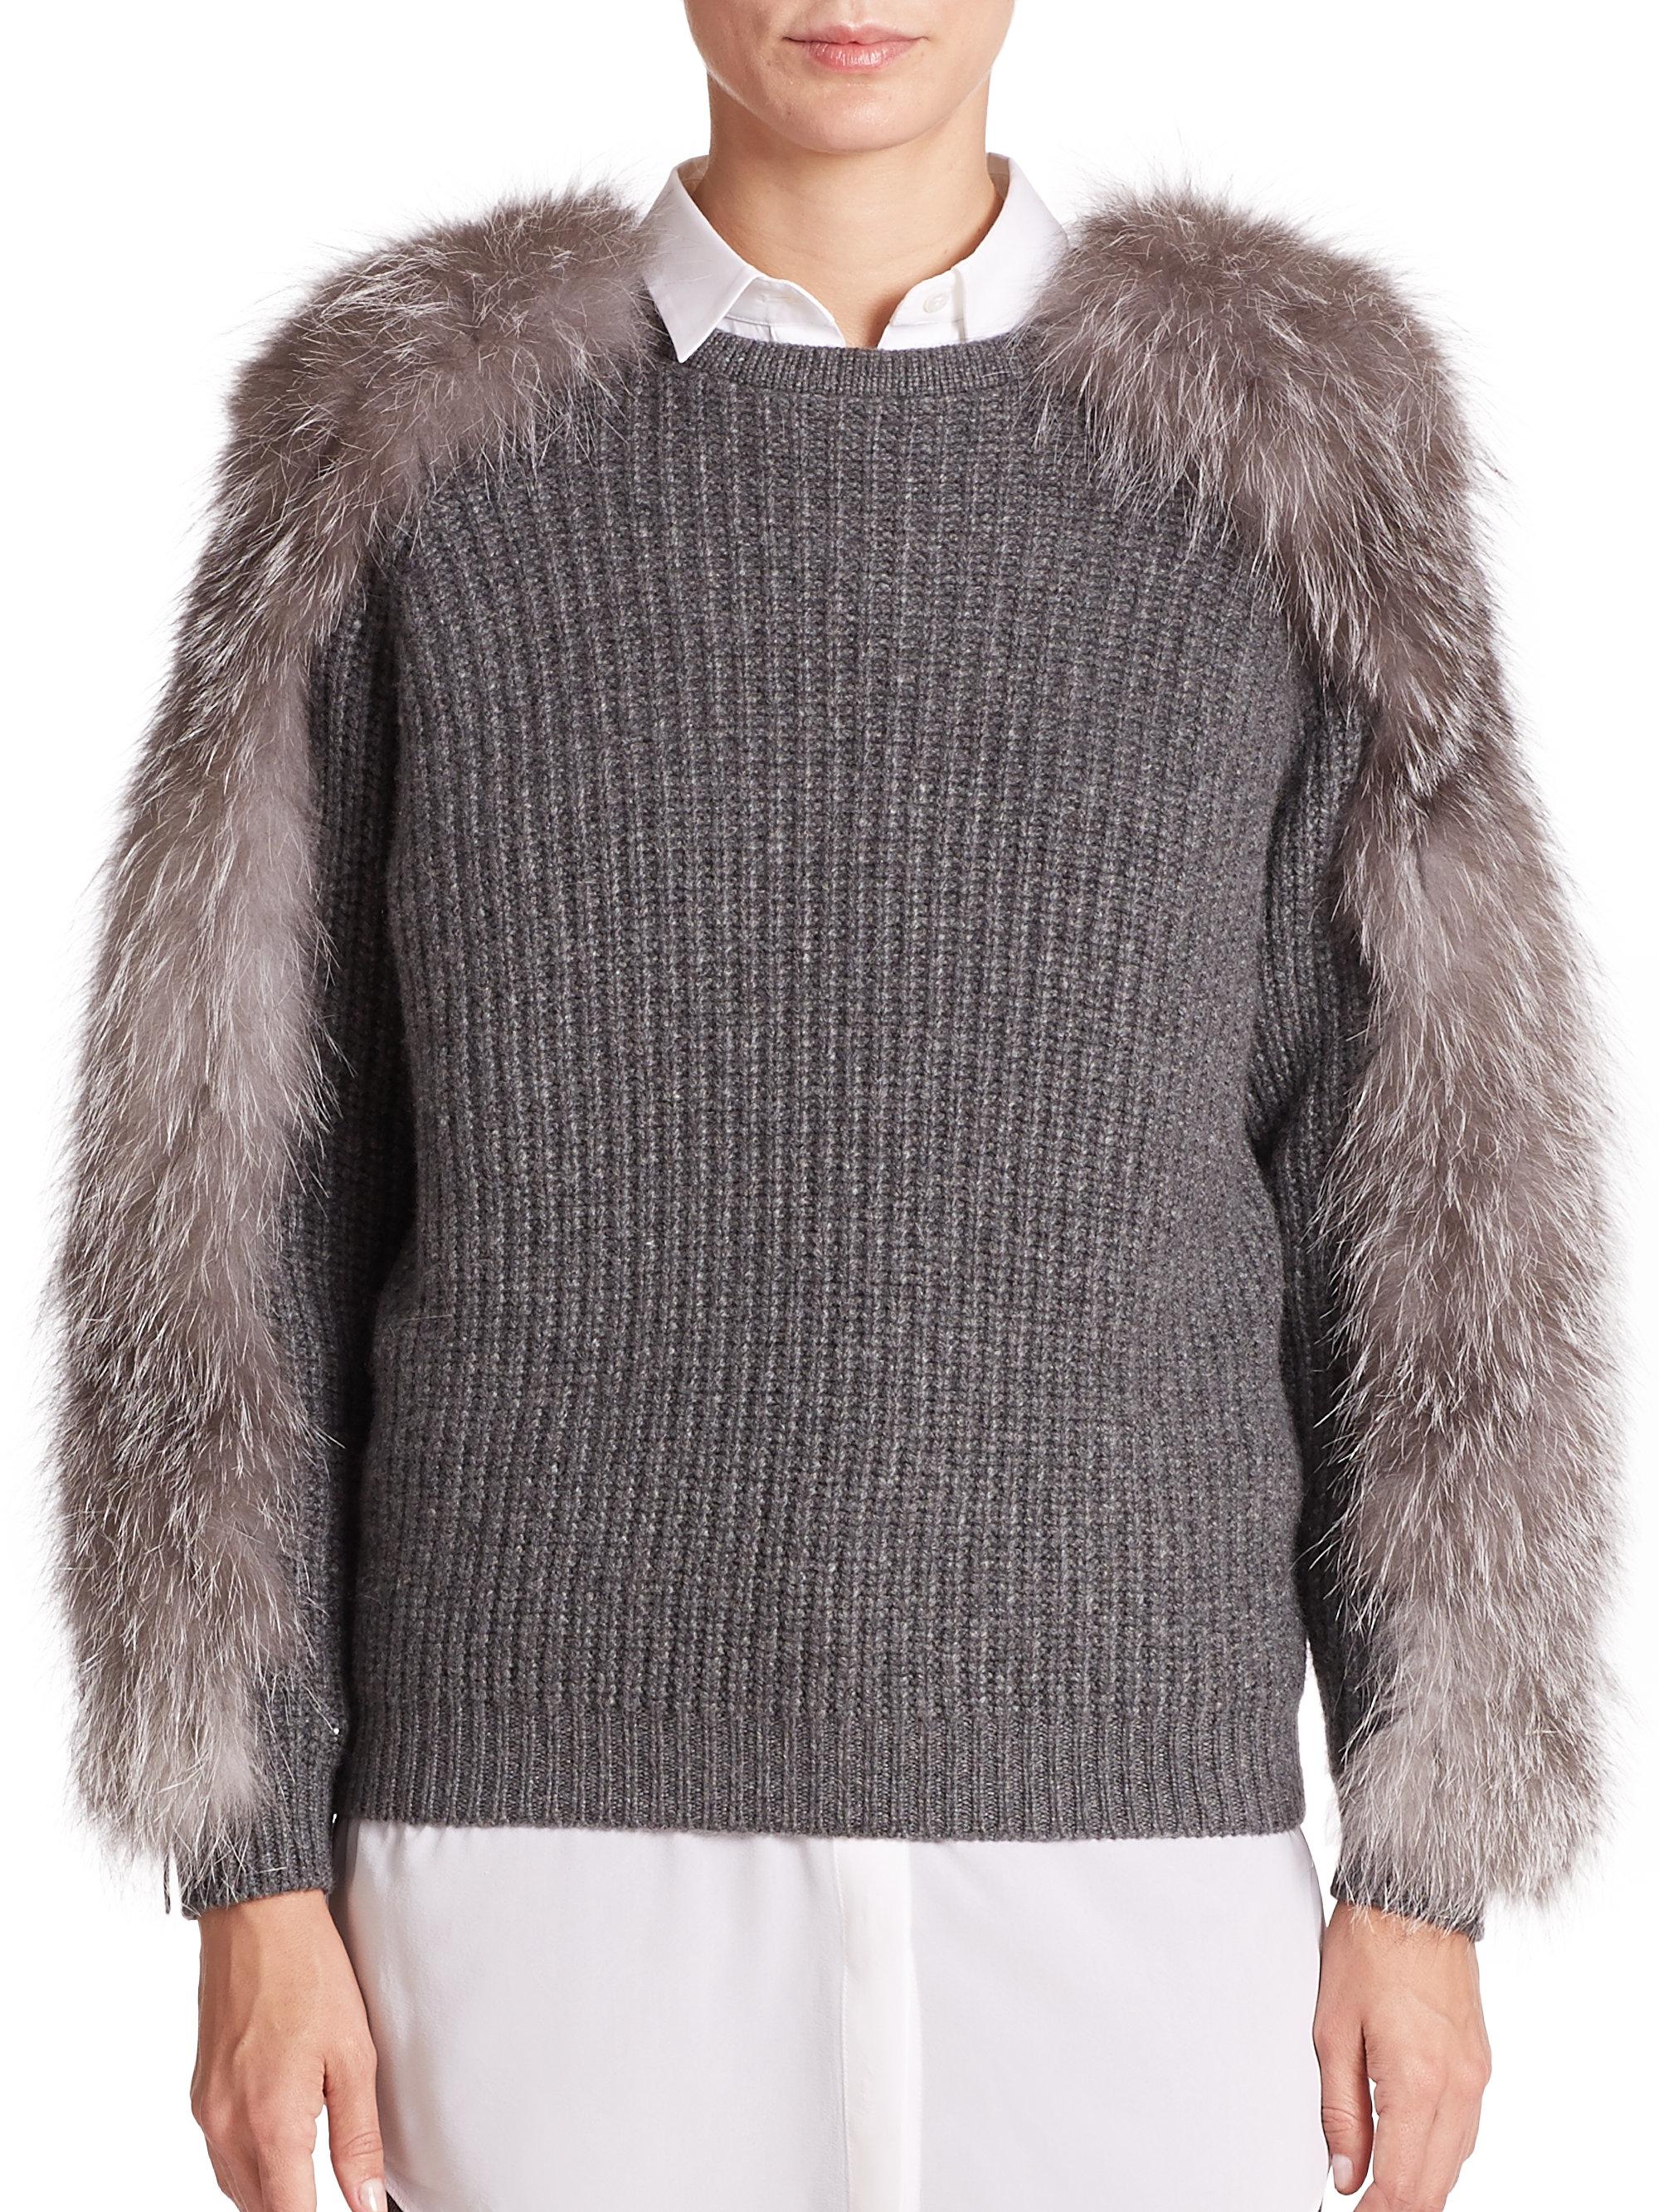 Brunello cucinelli Fur-trim Cashmere Sweater in Gray | Lyst